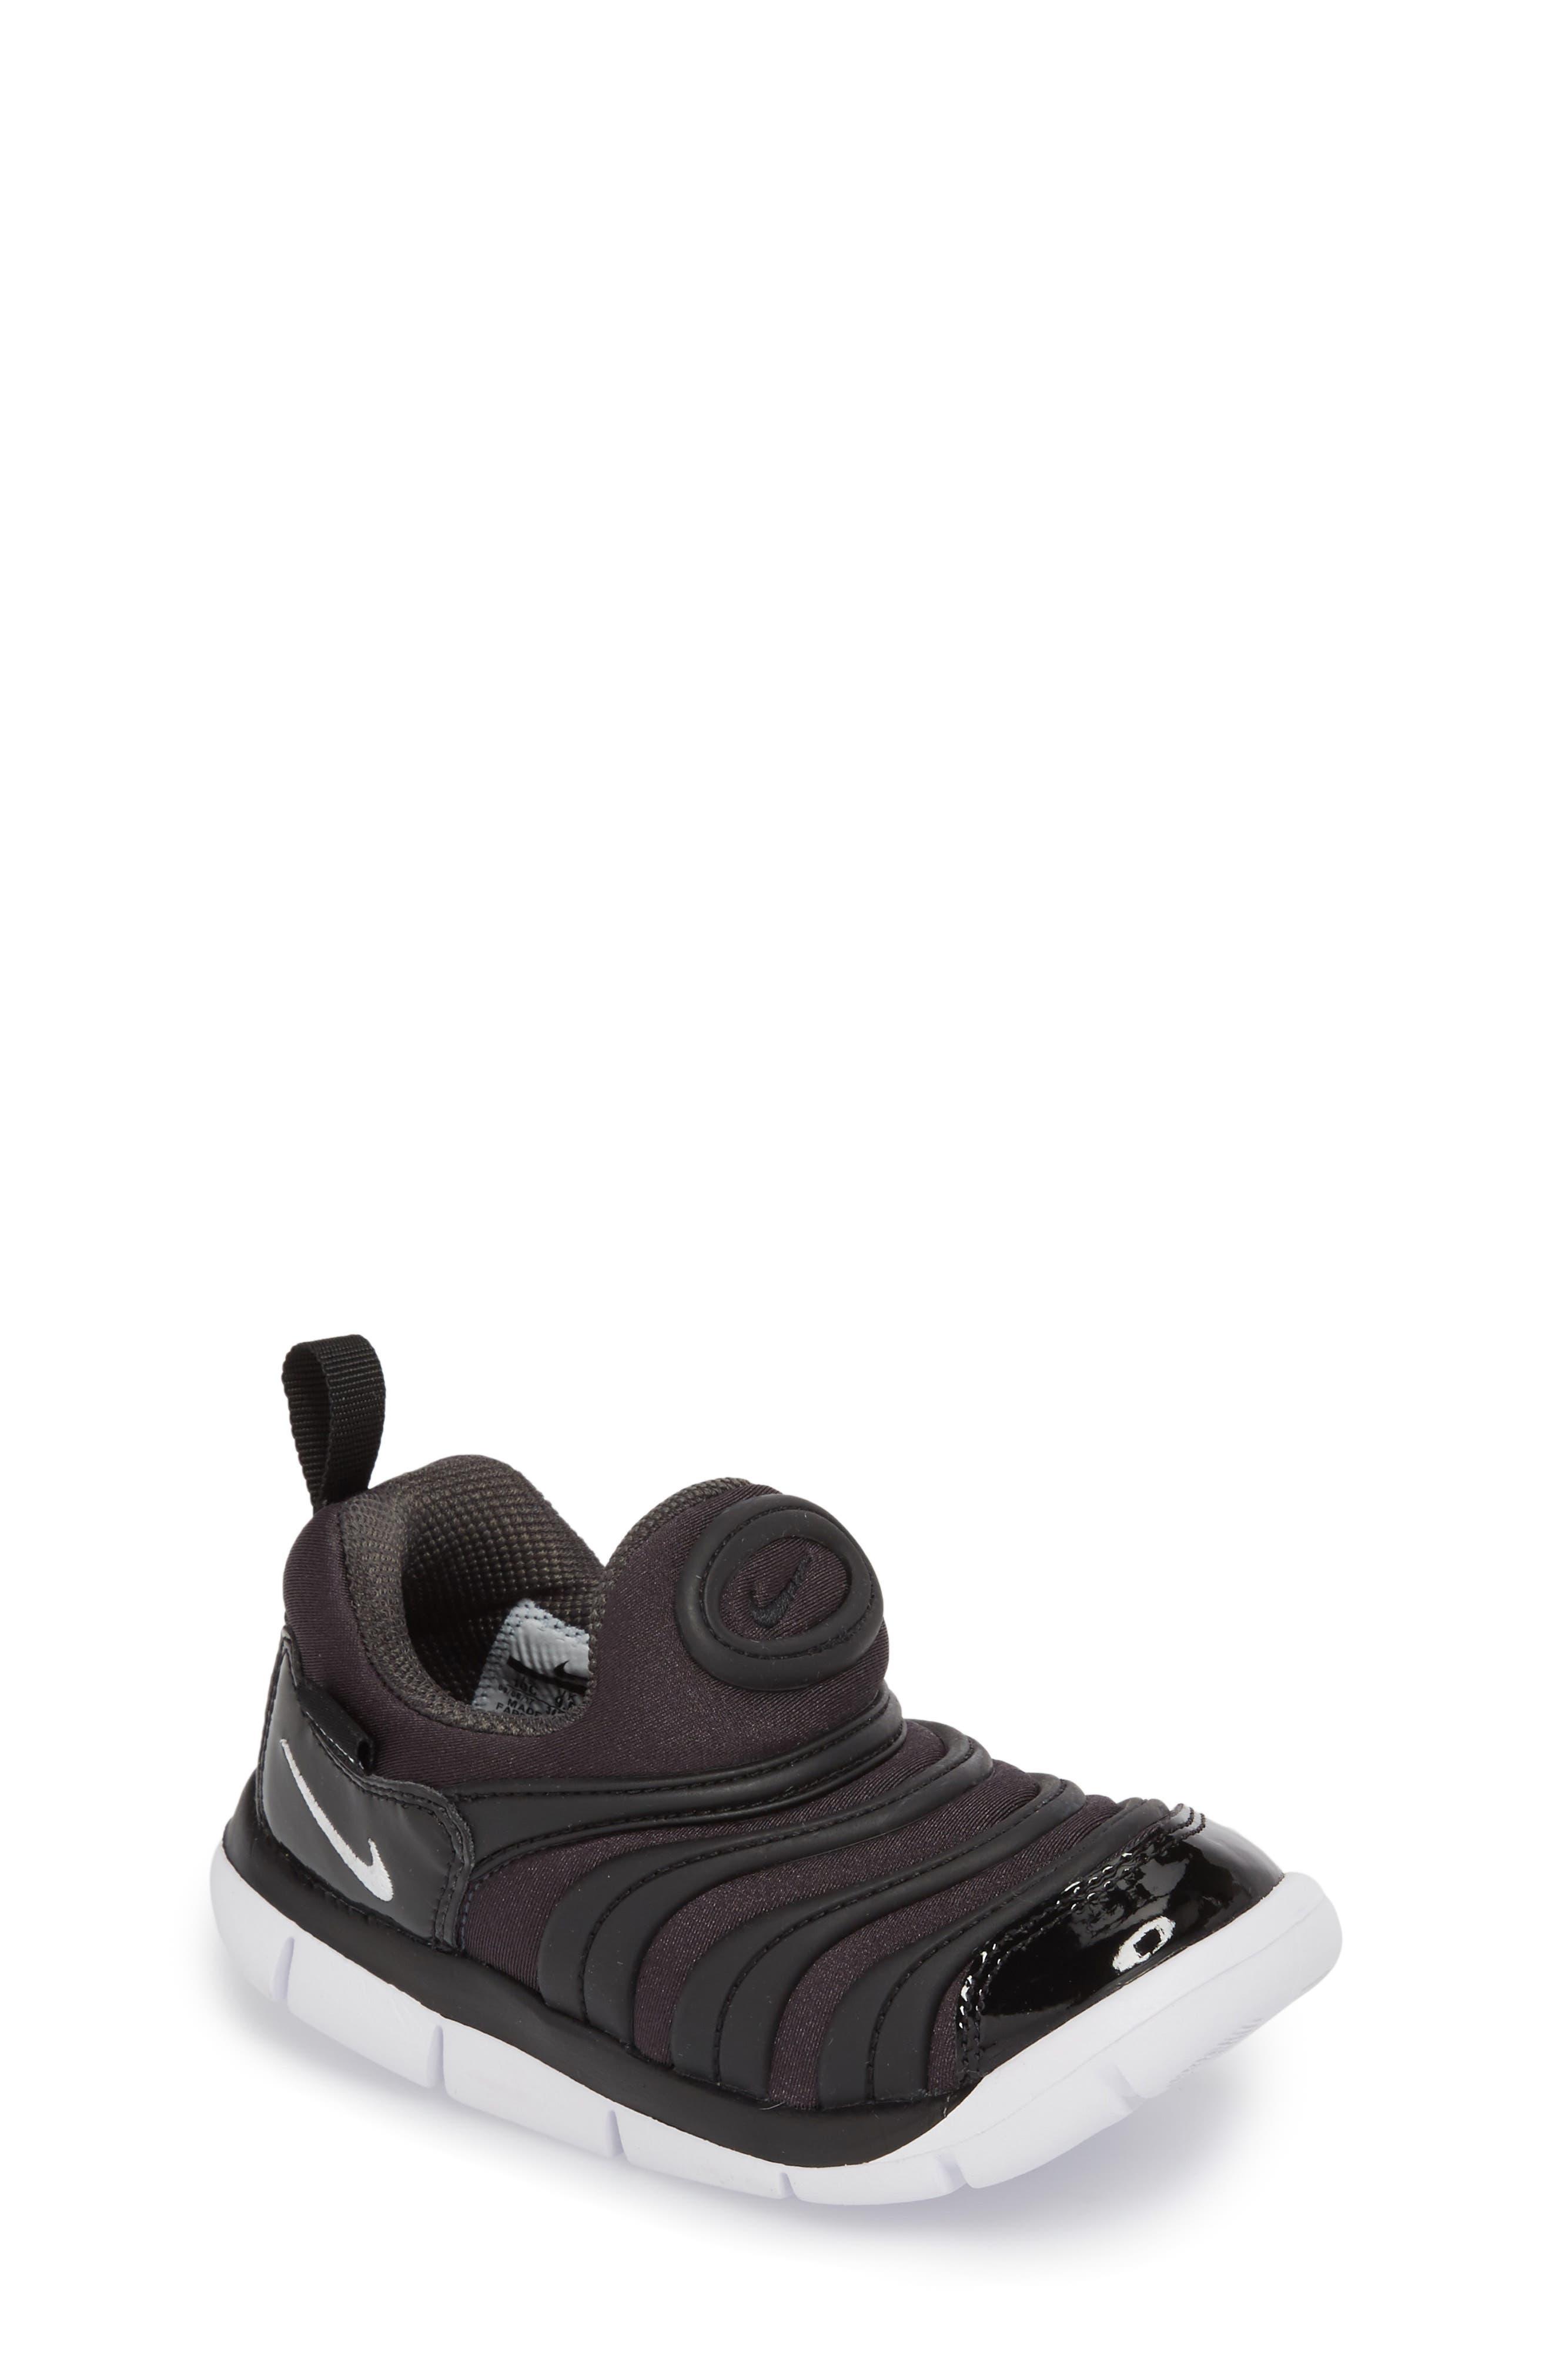 Dynamo Free Sneaker,                         Main,                         color, ANTHRACITE/ WHITE/ BLACK